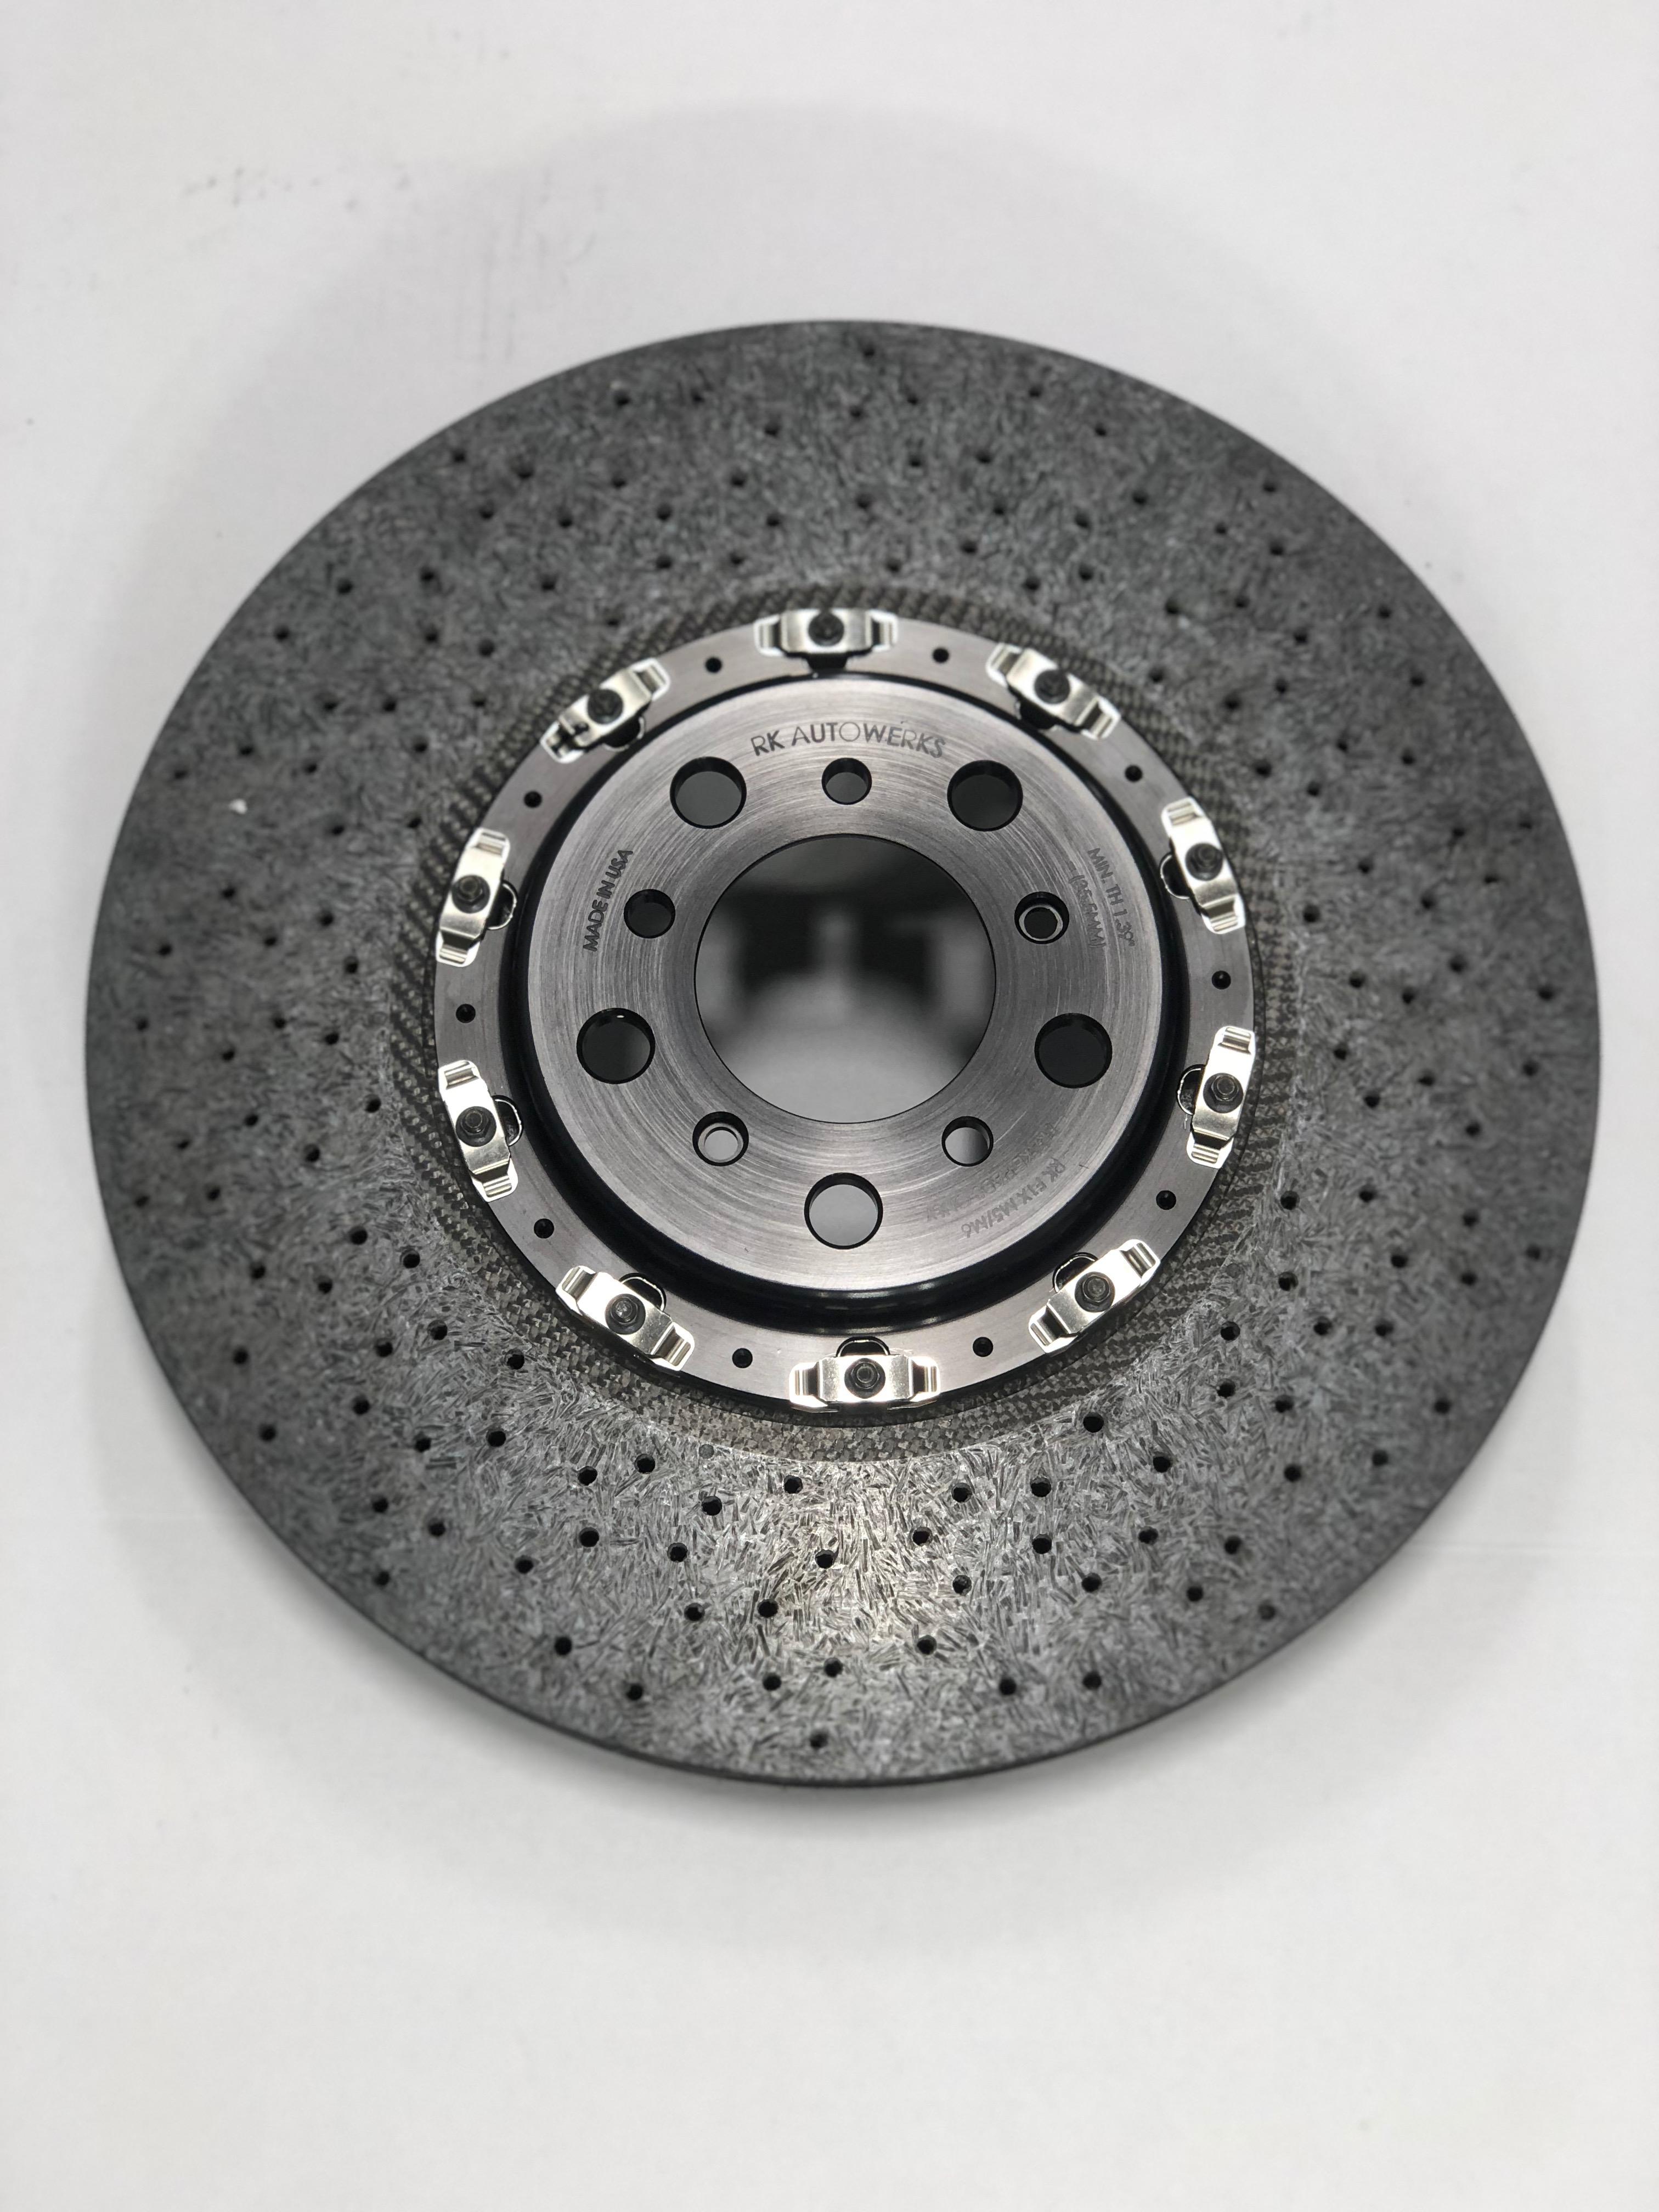 F10 M5 Carbon Ceramic Brakes Front Rkautowerks